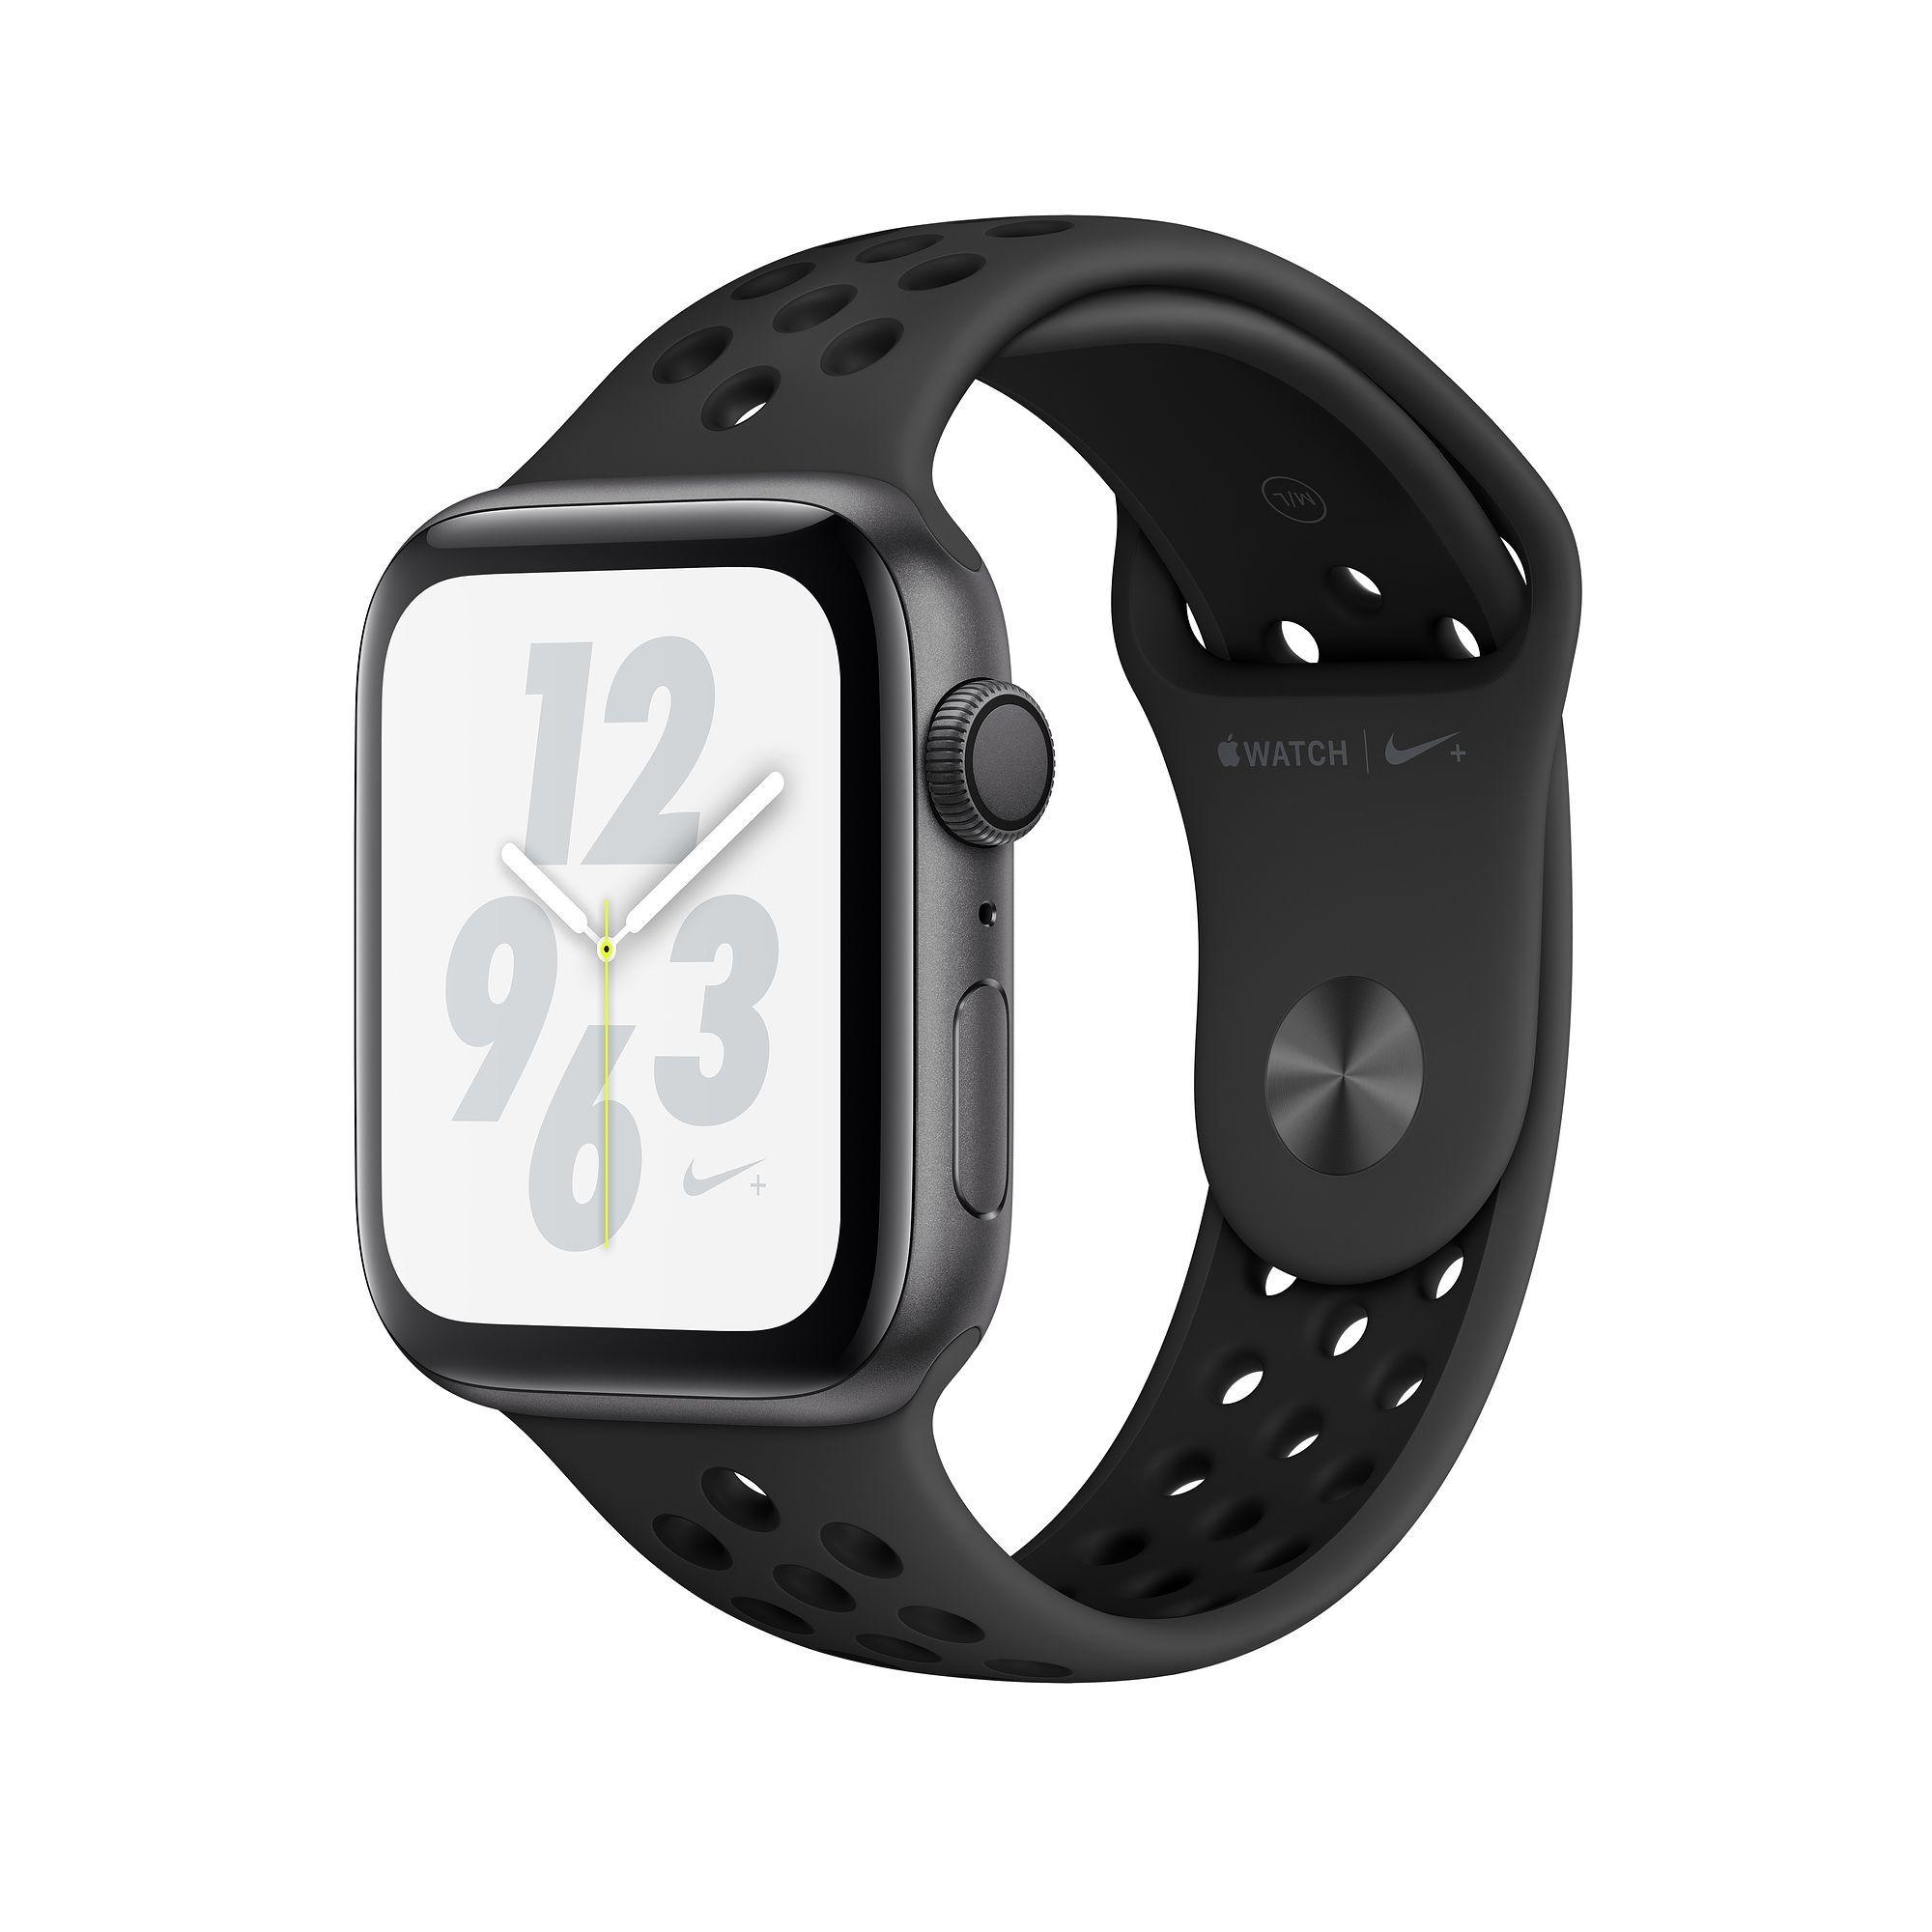 Apple Watch Nike+ Series 4 GPS, 40mm Space Gray Aluminum